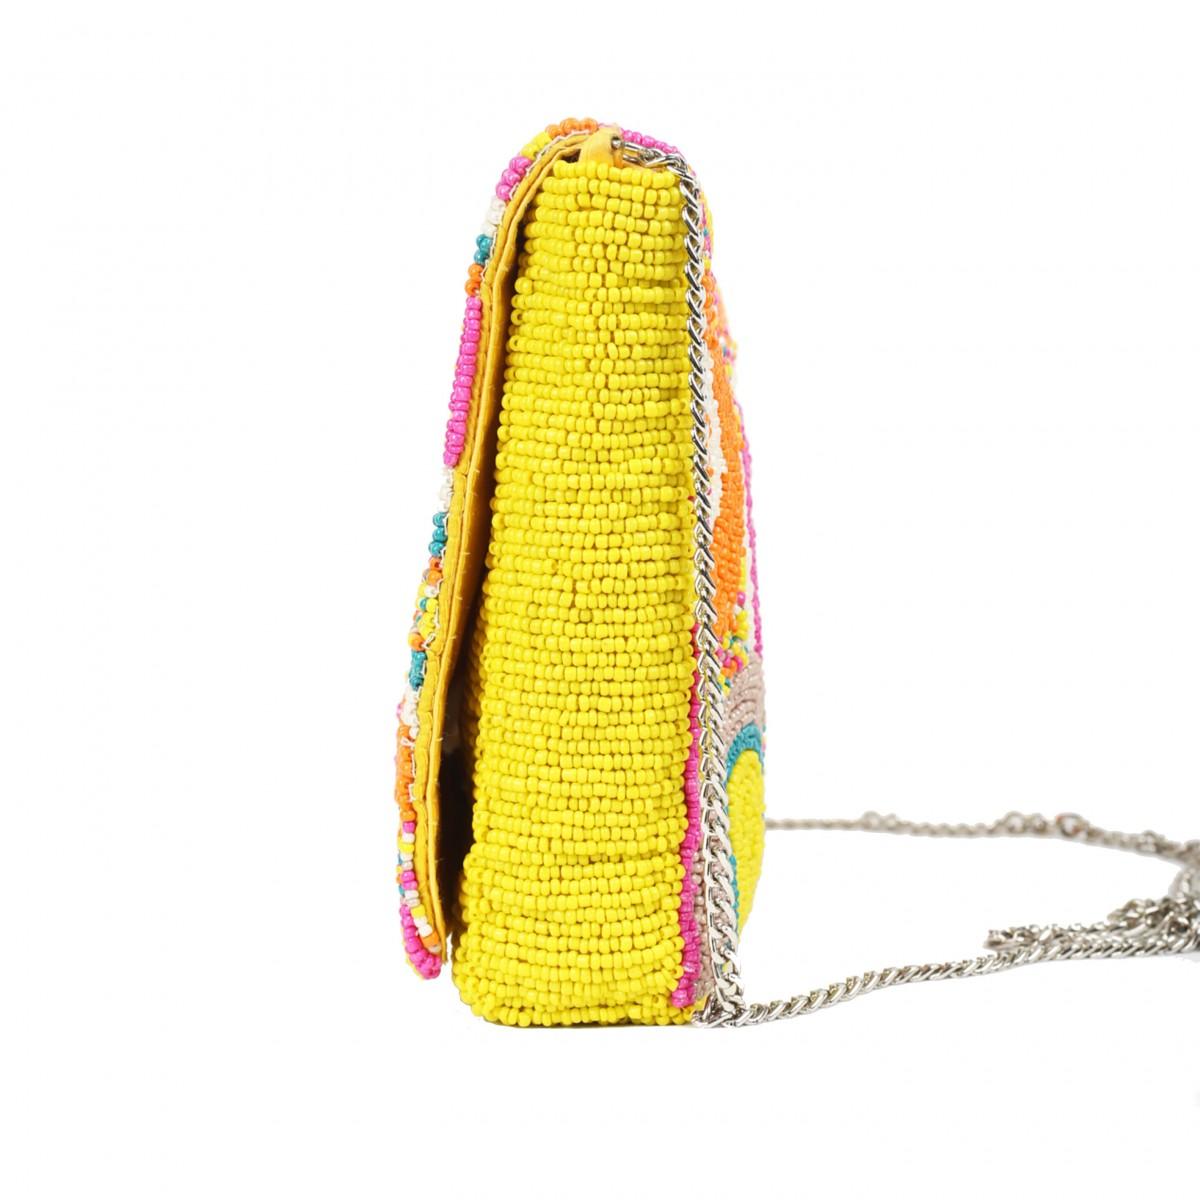 Beaded Evening  Box Clutch Bag - Multi Color